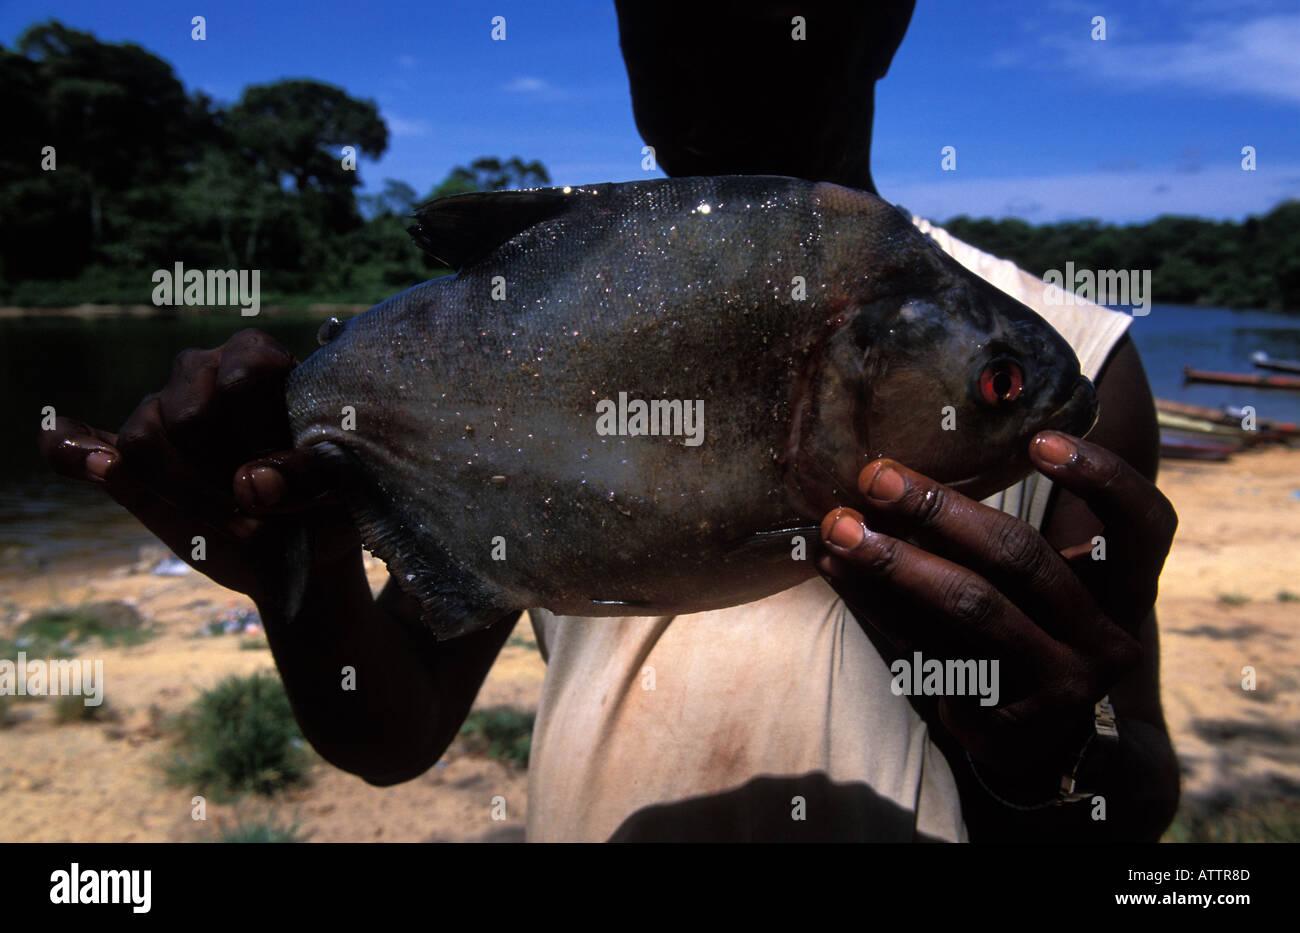 A piranha caught in the Suriname River - Stock Image